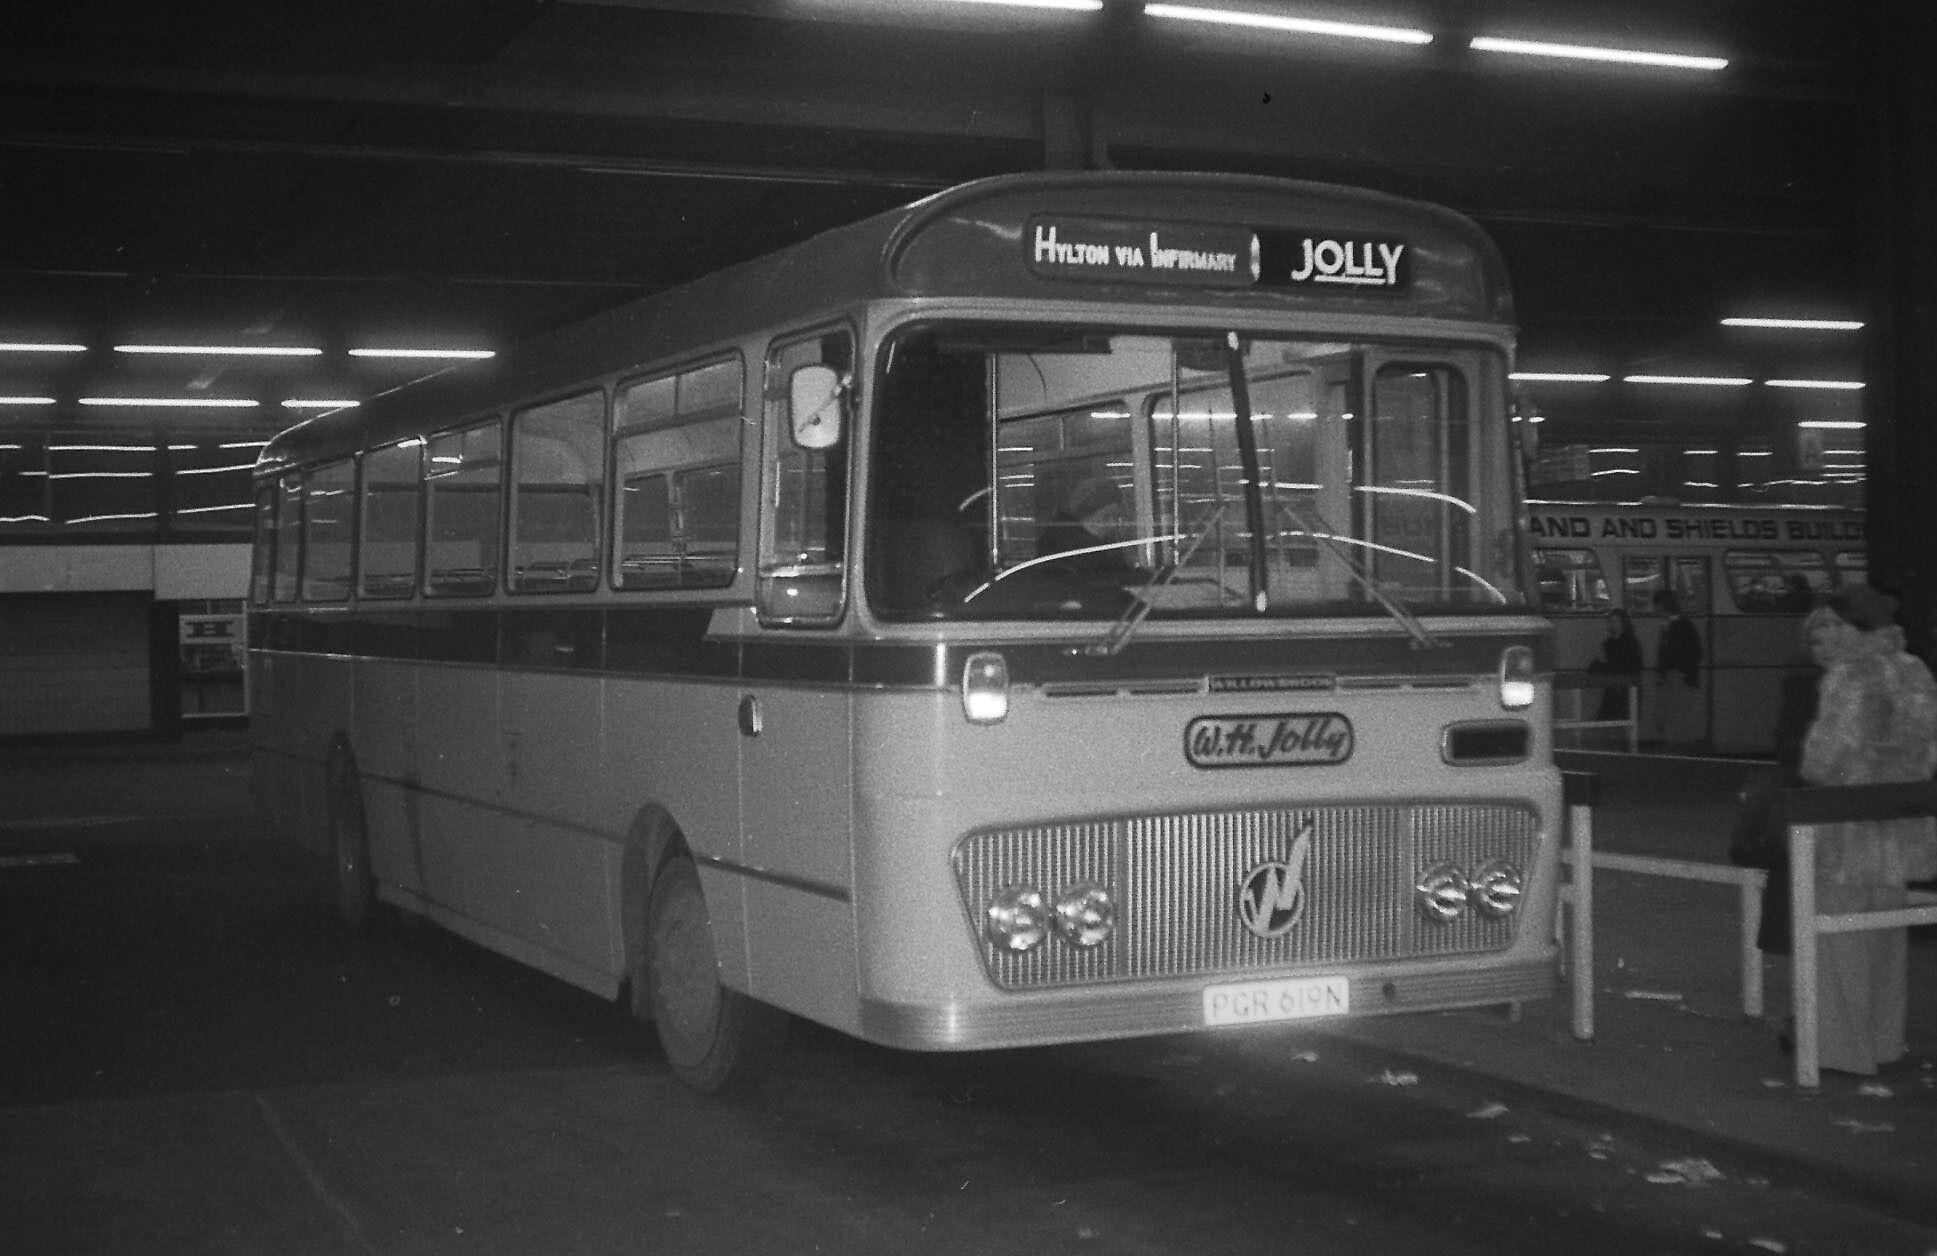 tynexwear jolly south hylton pgr619n central bus sta